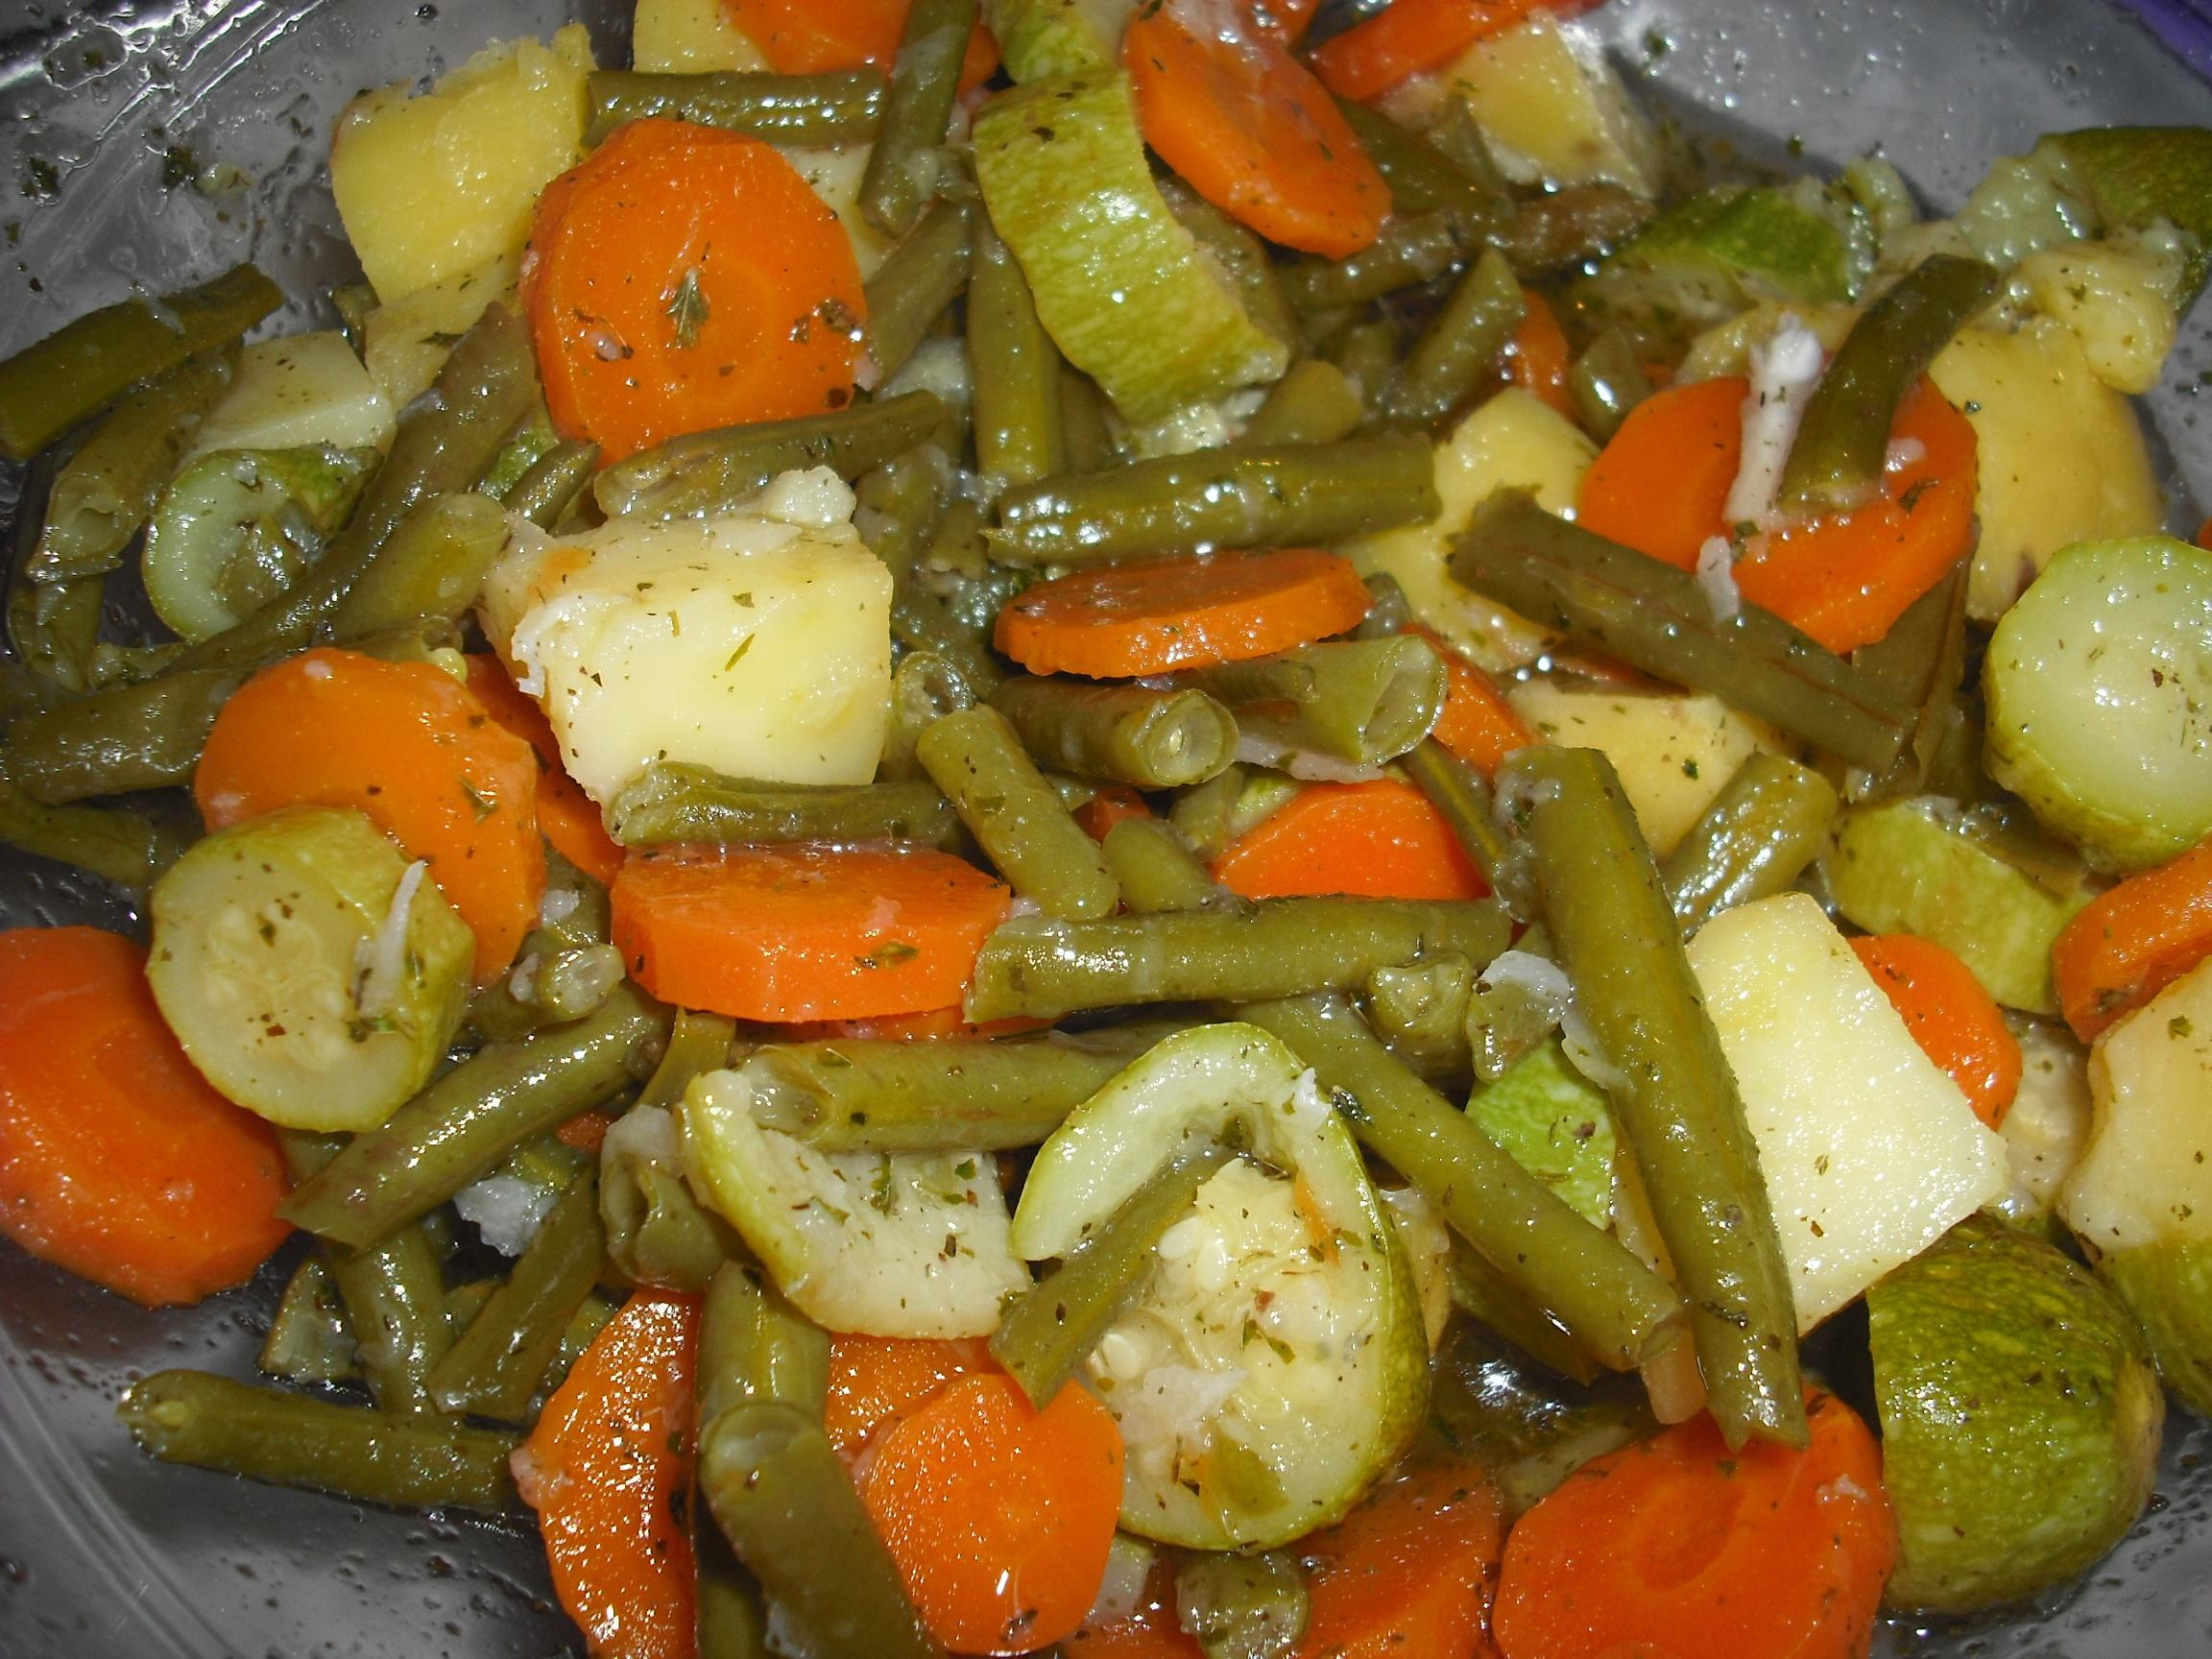 Thumbnail for Salade aux 4 légumes – سلطة خضراء مسلوقة